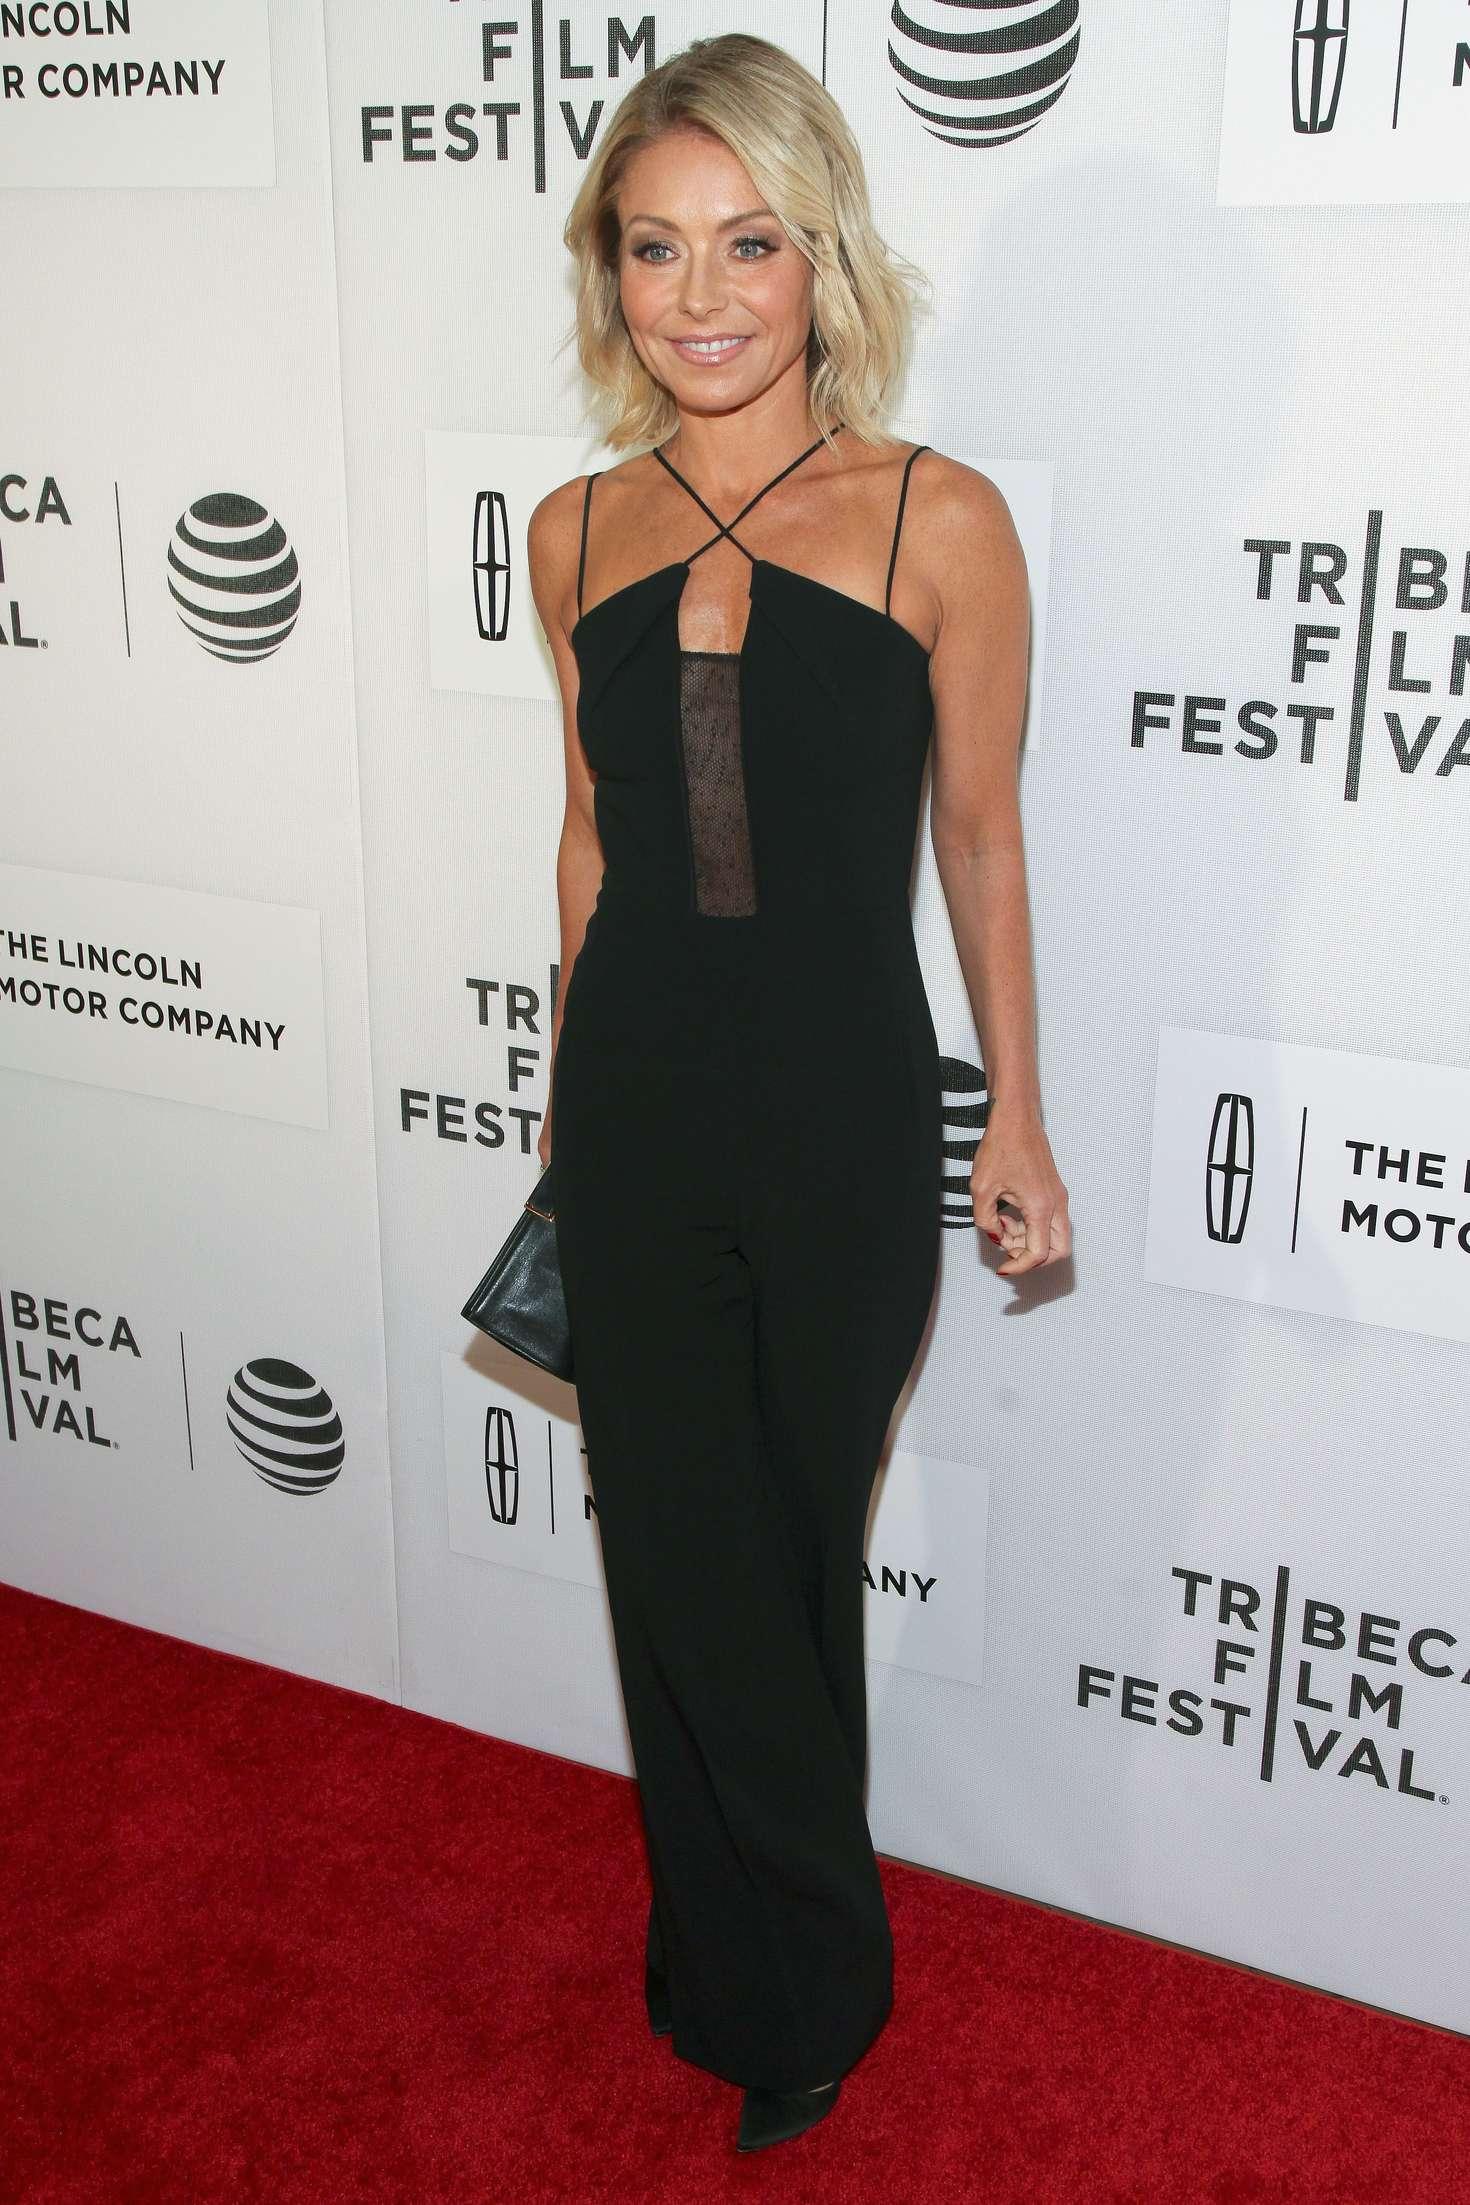 Kelly Ripa Custody Premiere at Tribeca Film Festival in New York